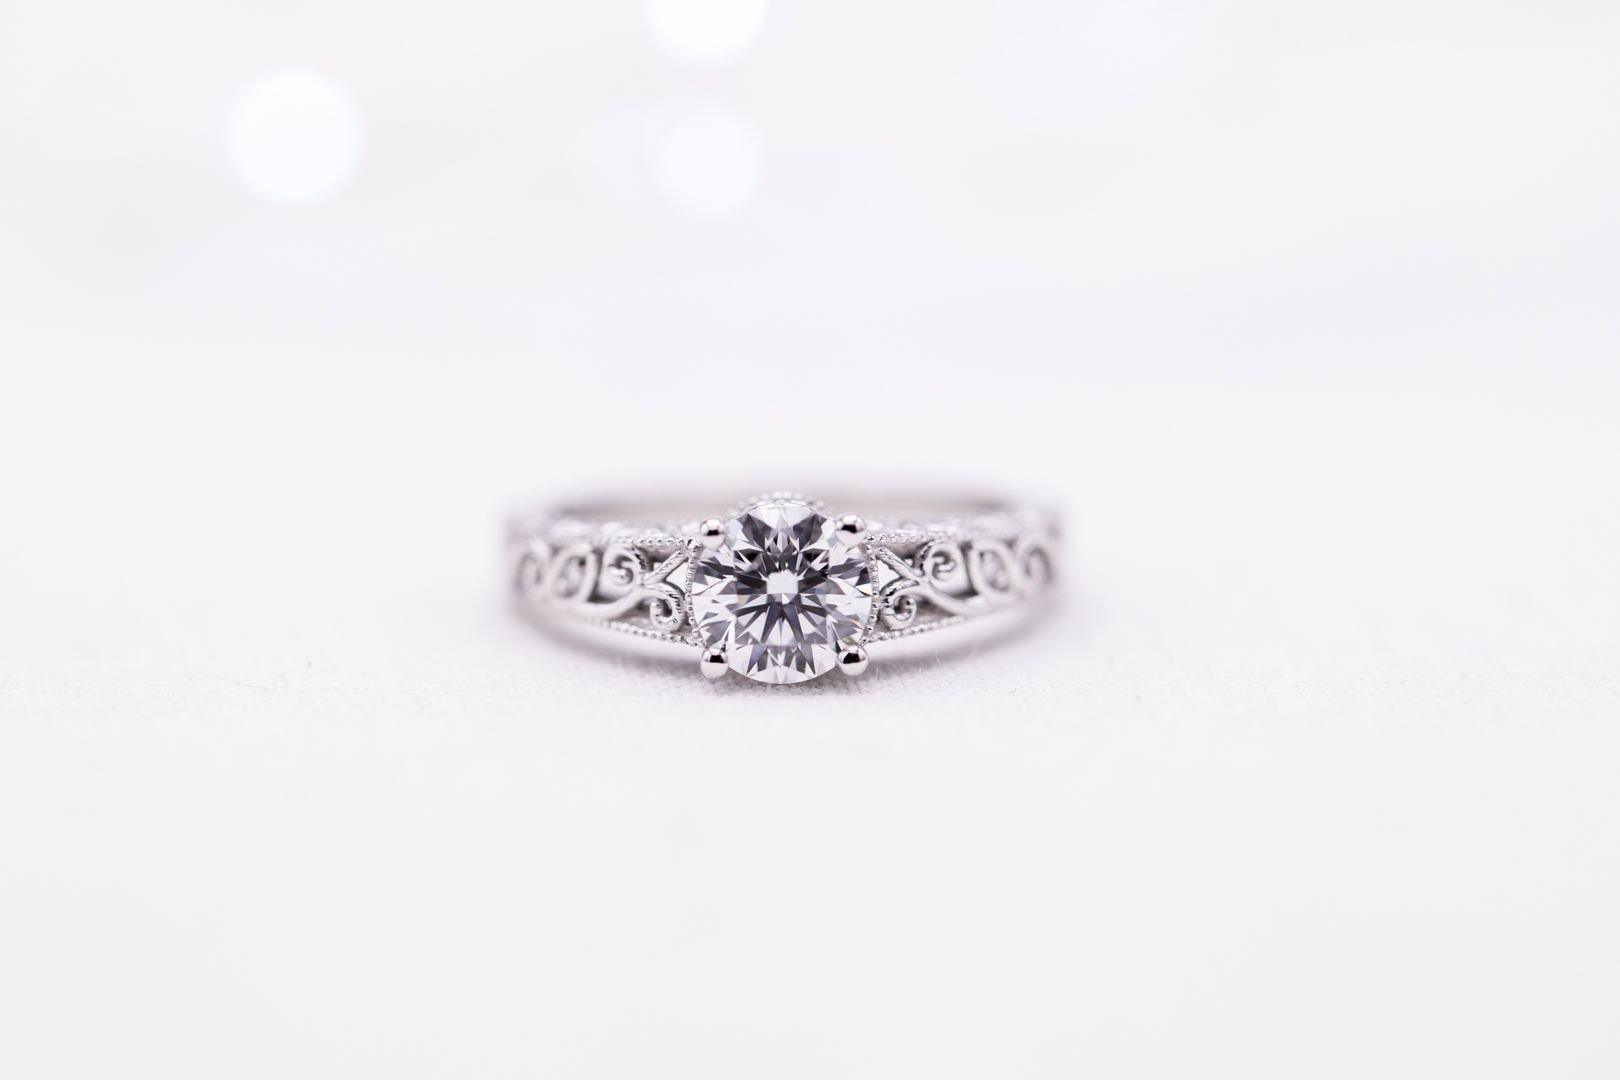 buying a one carat diamond ring - 0.9ct lab-made round diamond